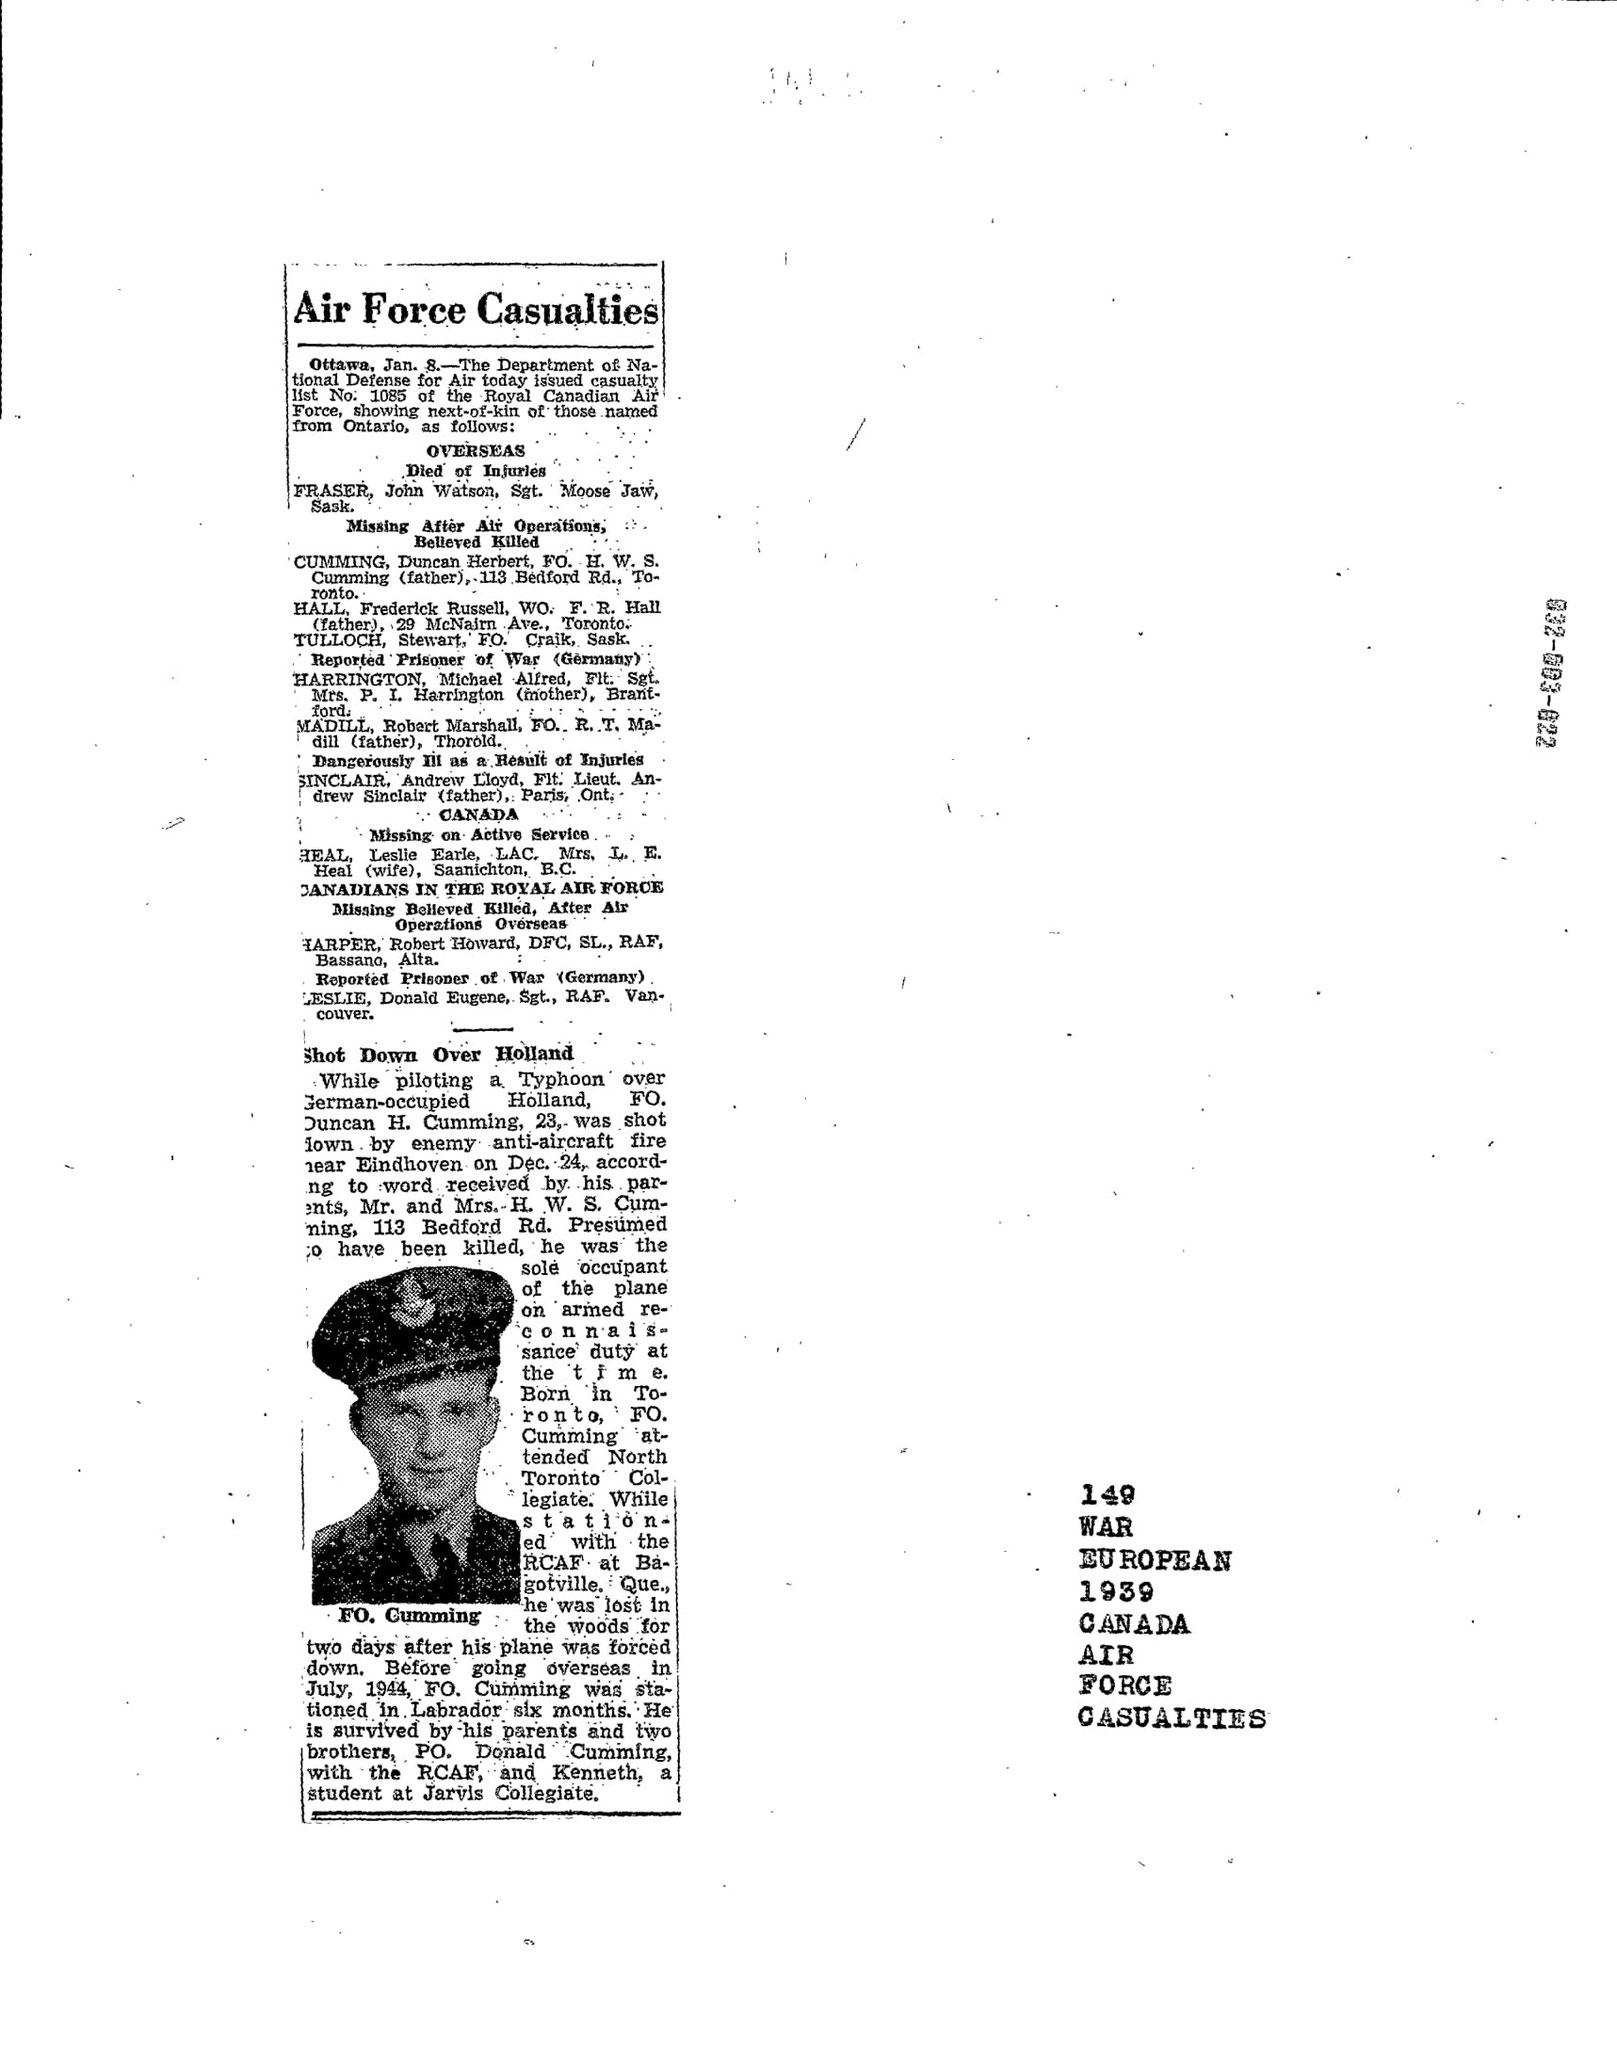 Globe and Mail 9-1-1945